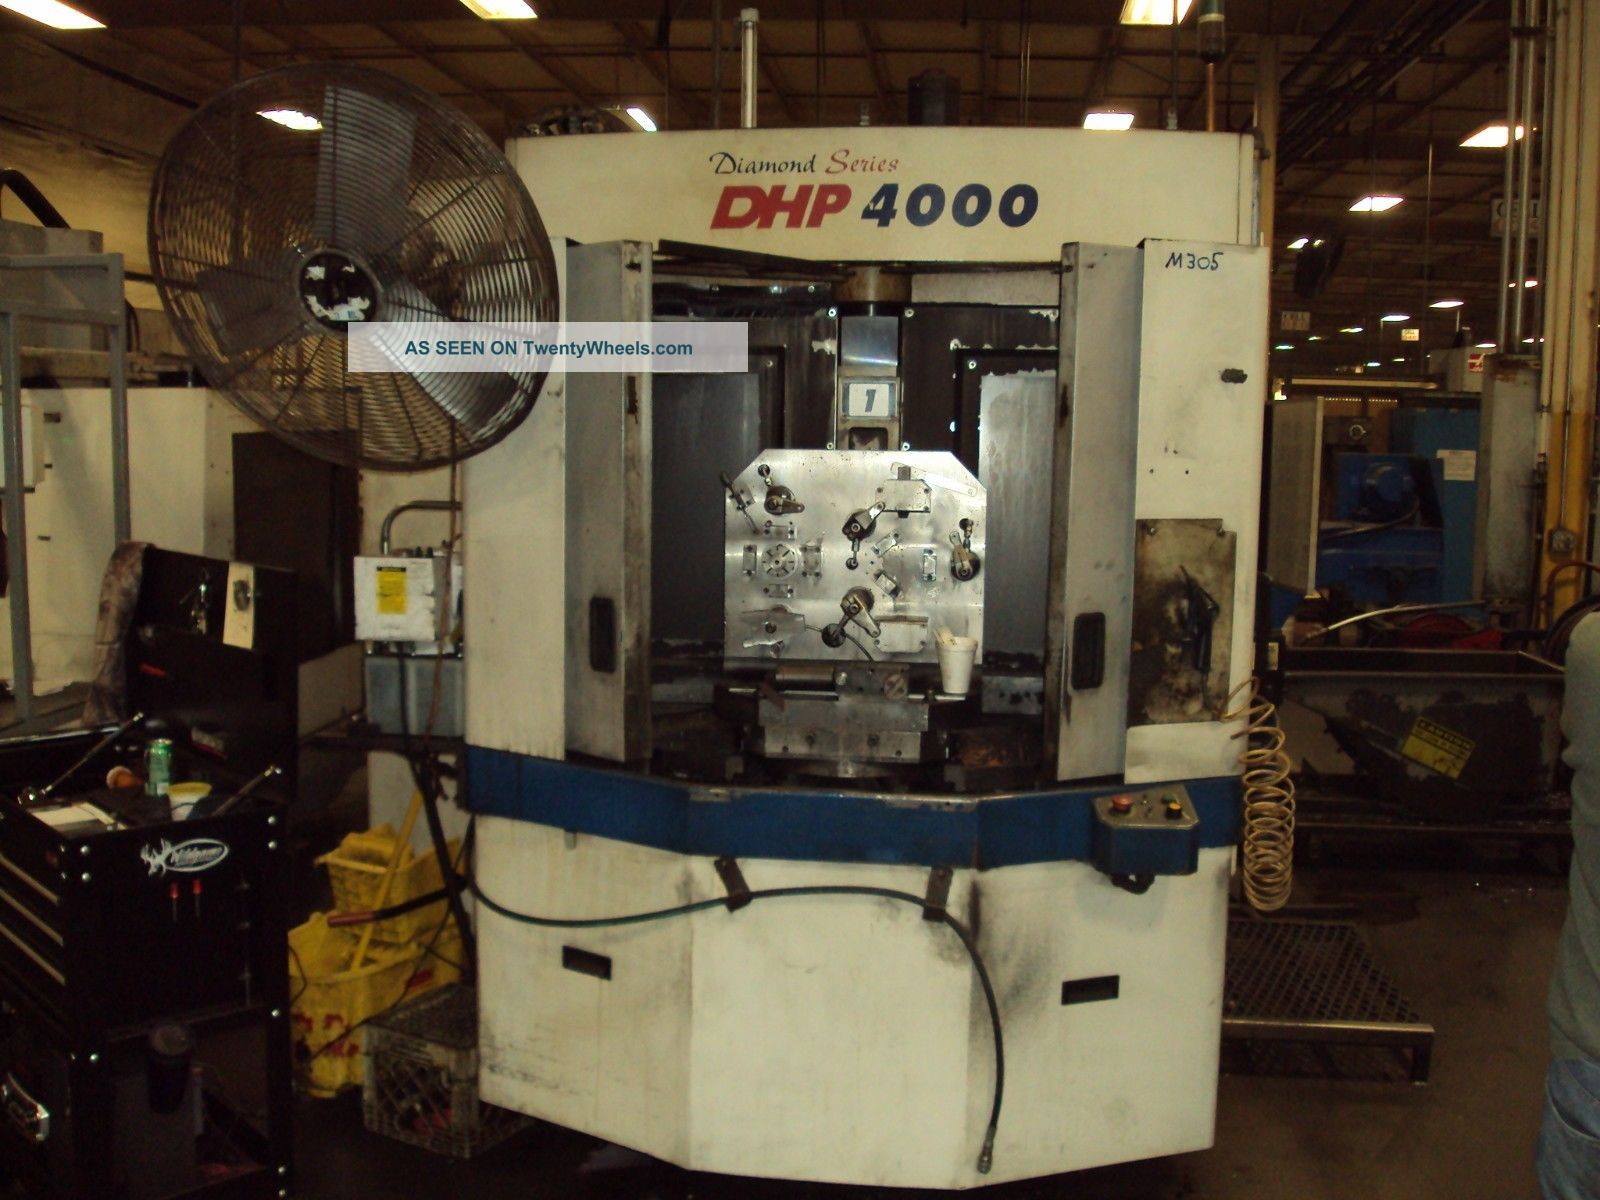 Doosan Dhp 4000 400mm Cnc Horizontal Machining Center Daewoo Fanuc 2005 Milling Machines photo